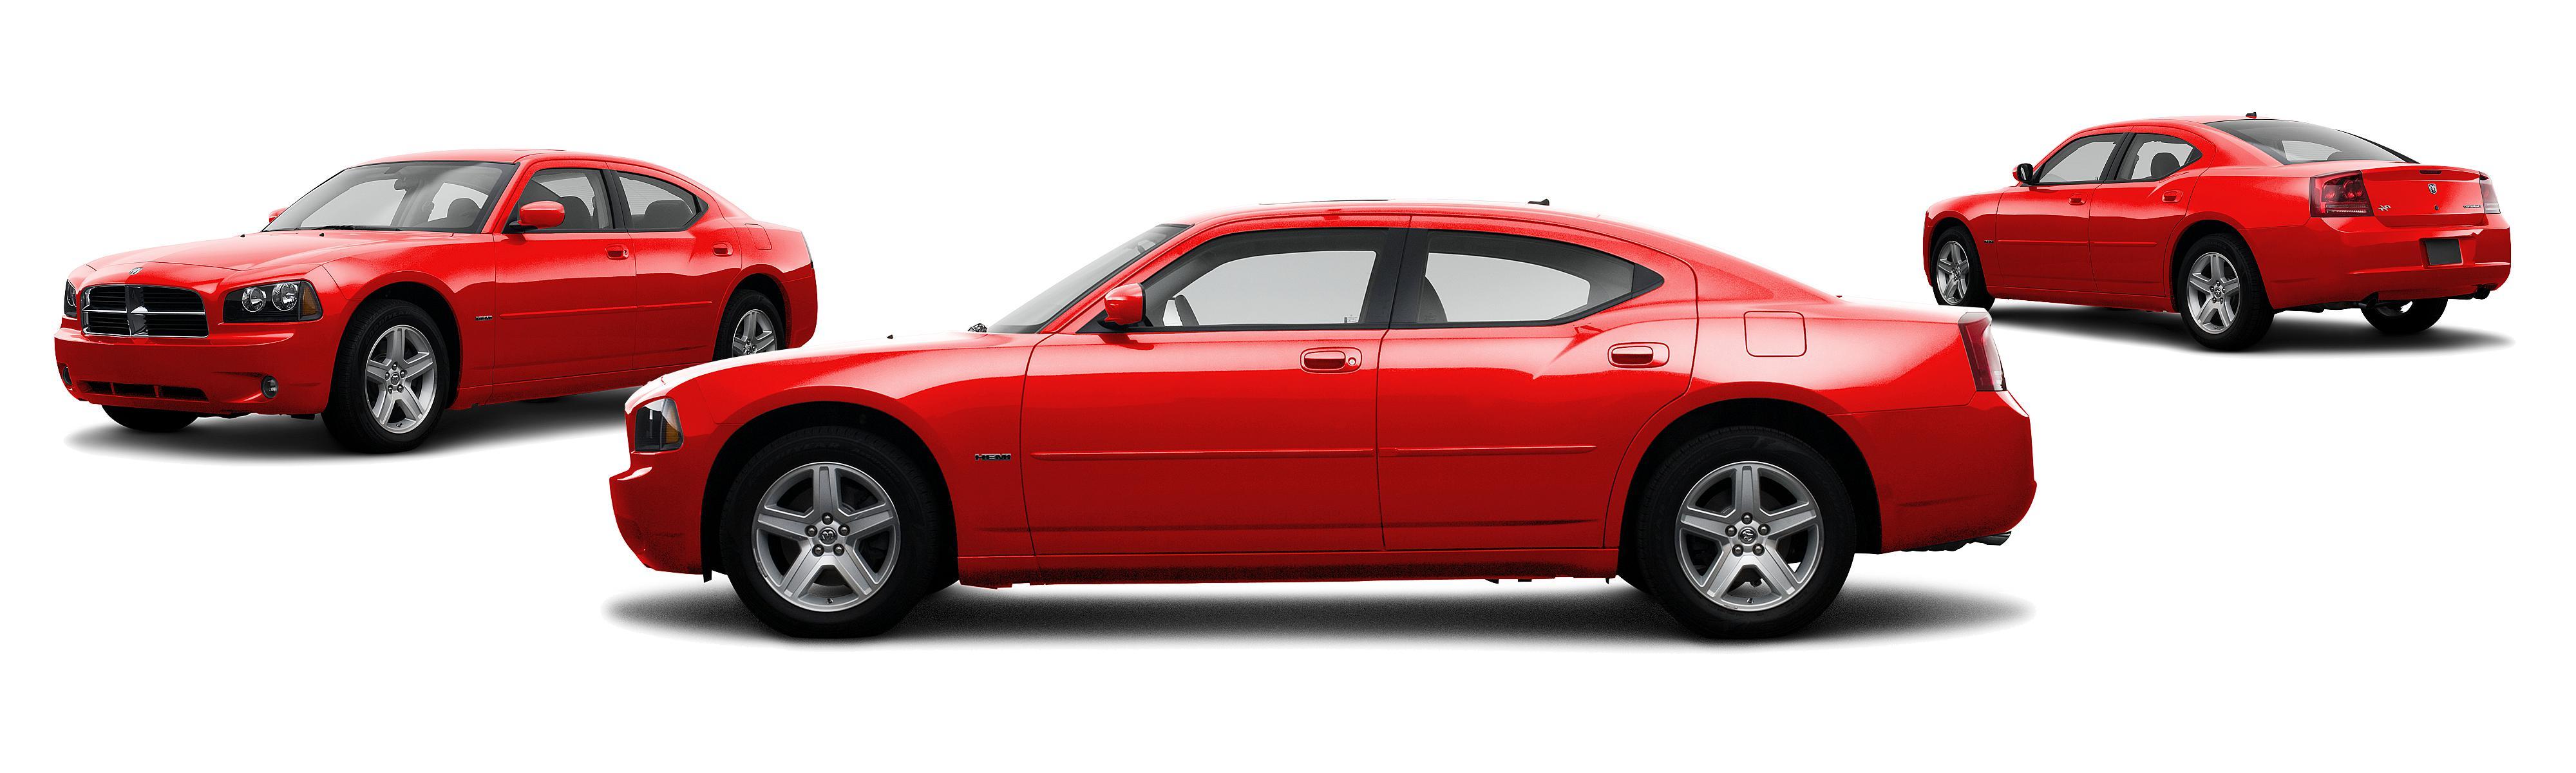 garage car speedfactory t llc dodge project ed swap detail meet chrysler s r charger rt daytona group